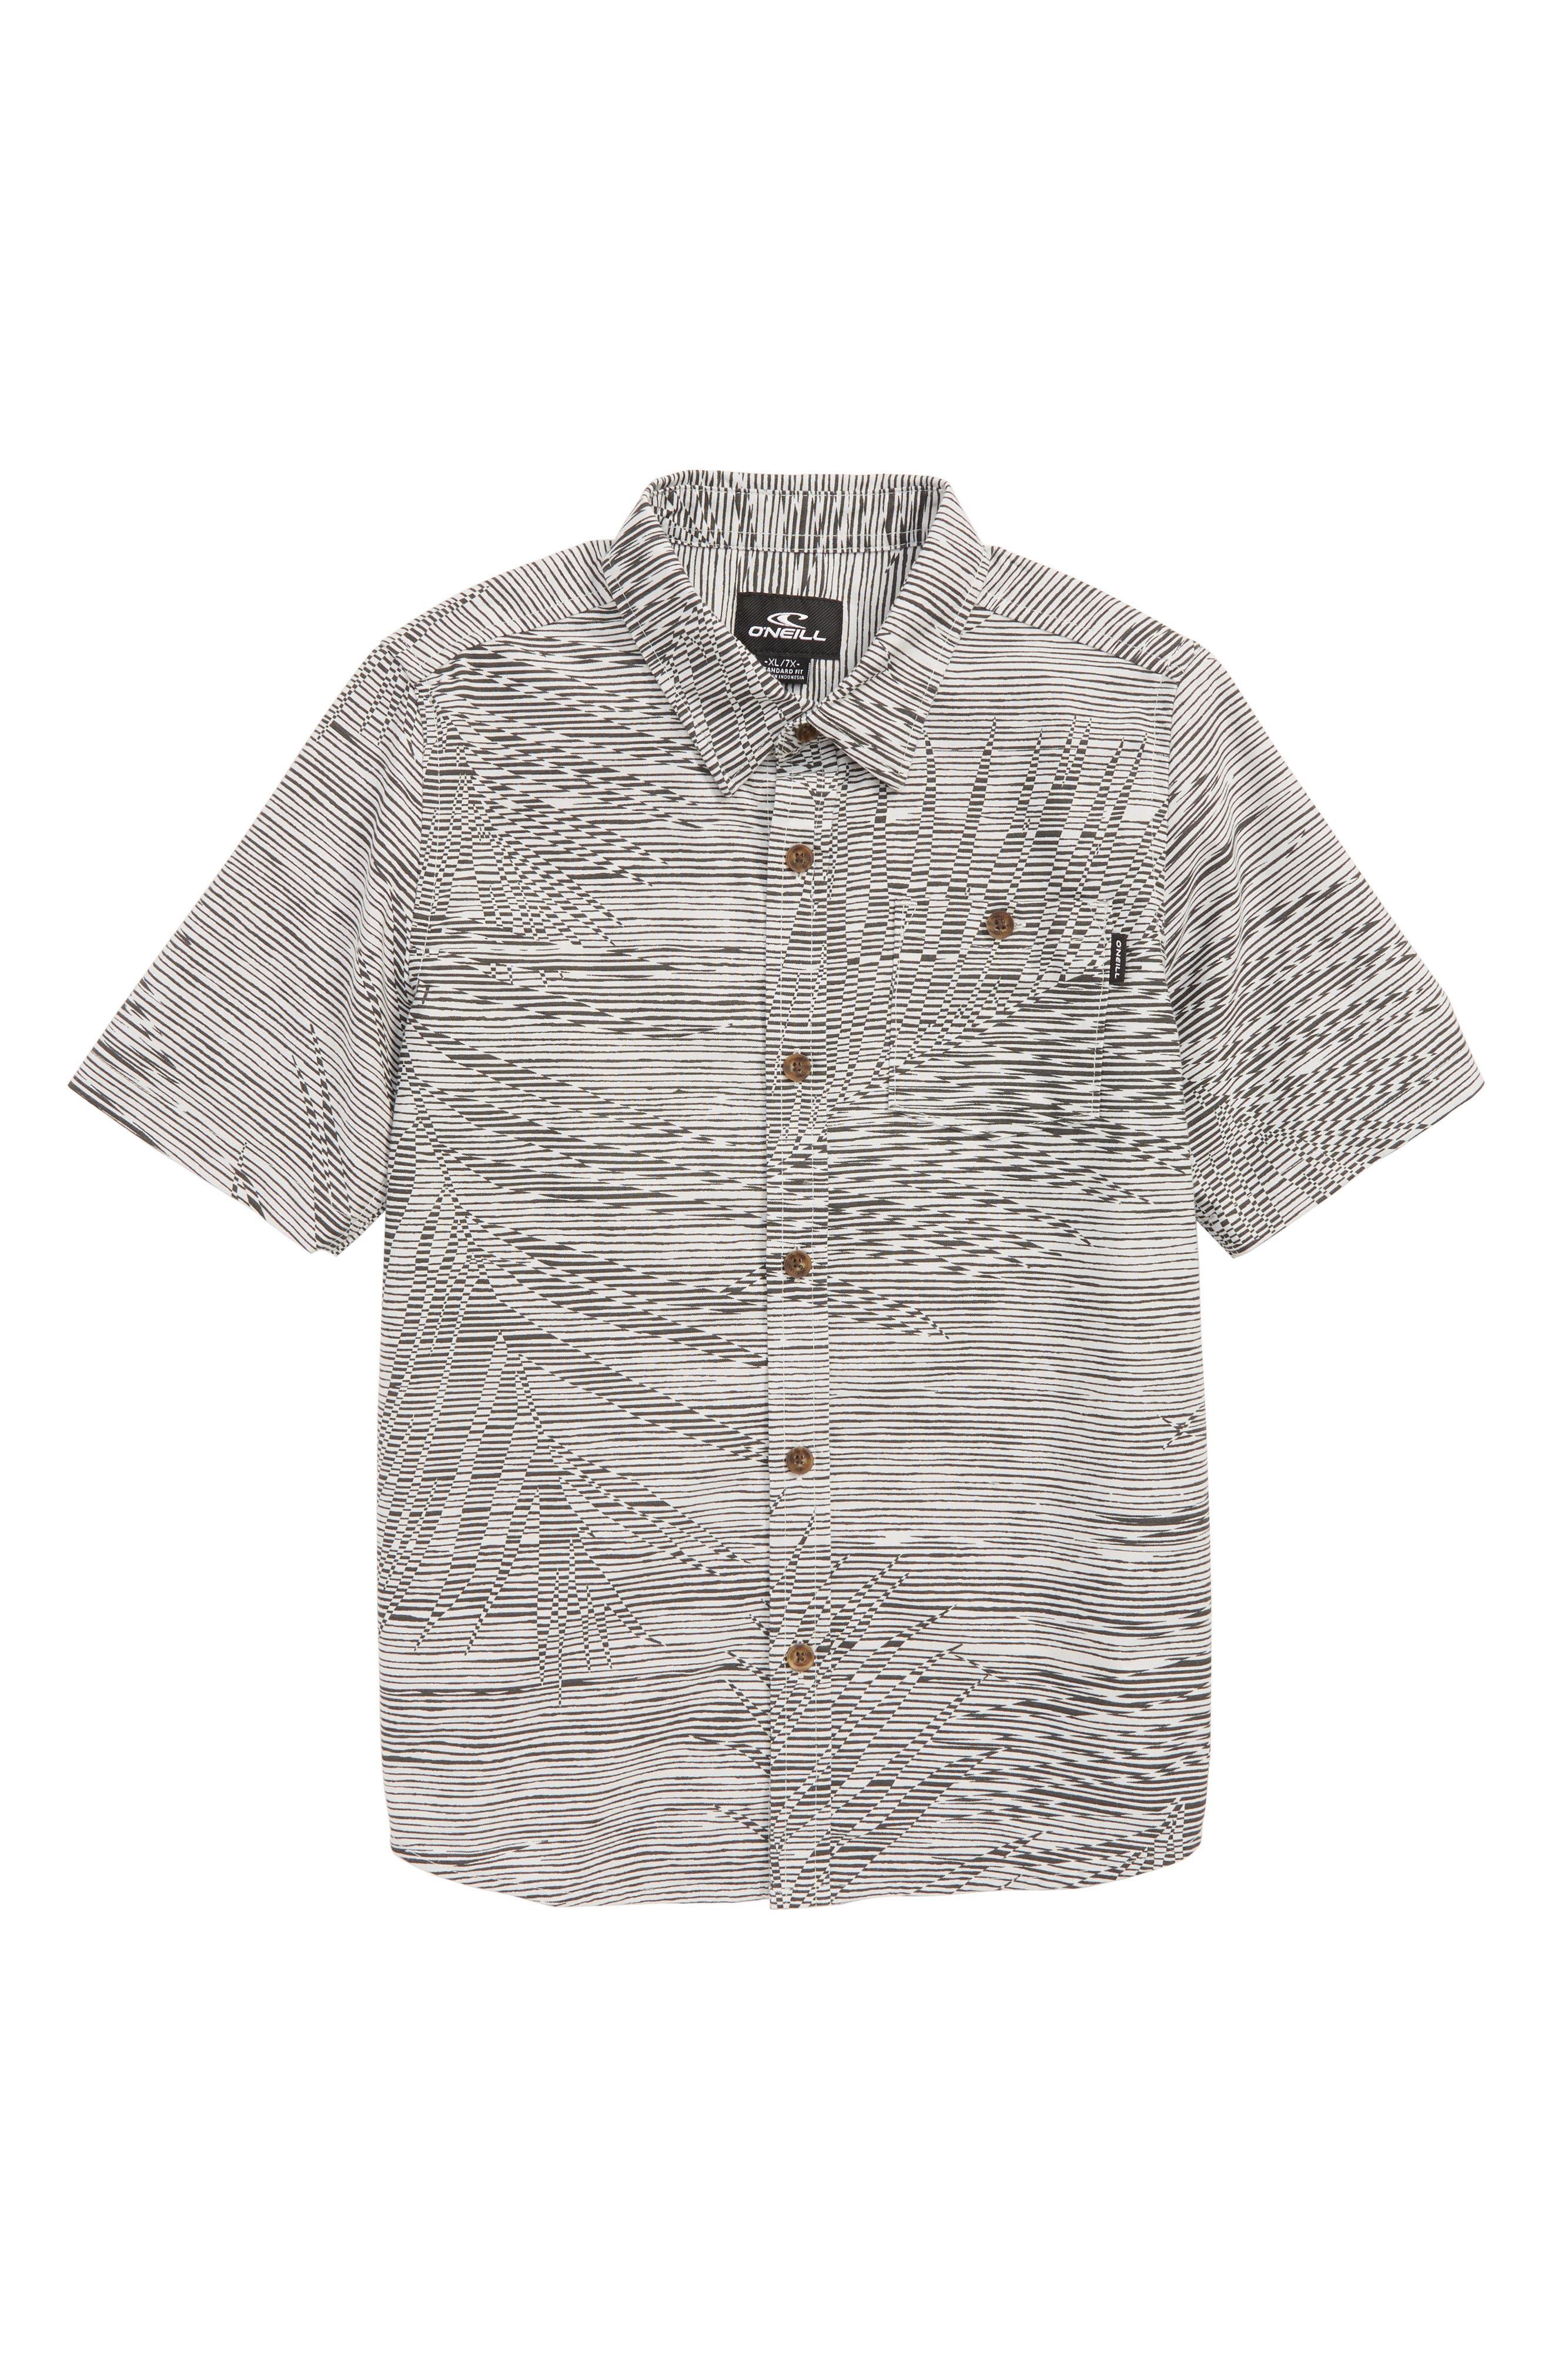 Fronzarelli Woven Shirt,                         Main,                         color, 036